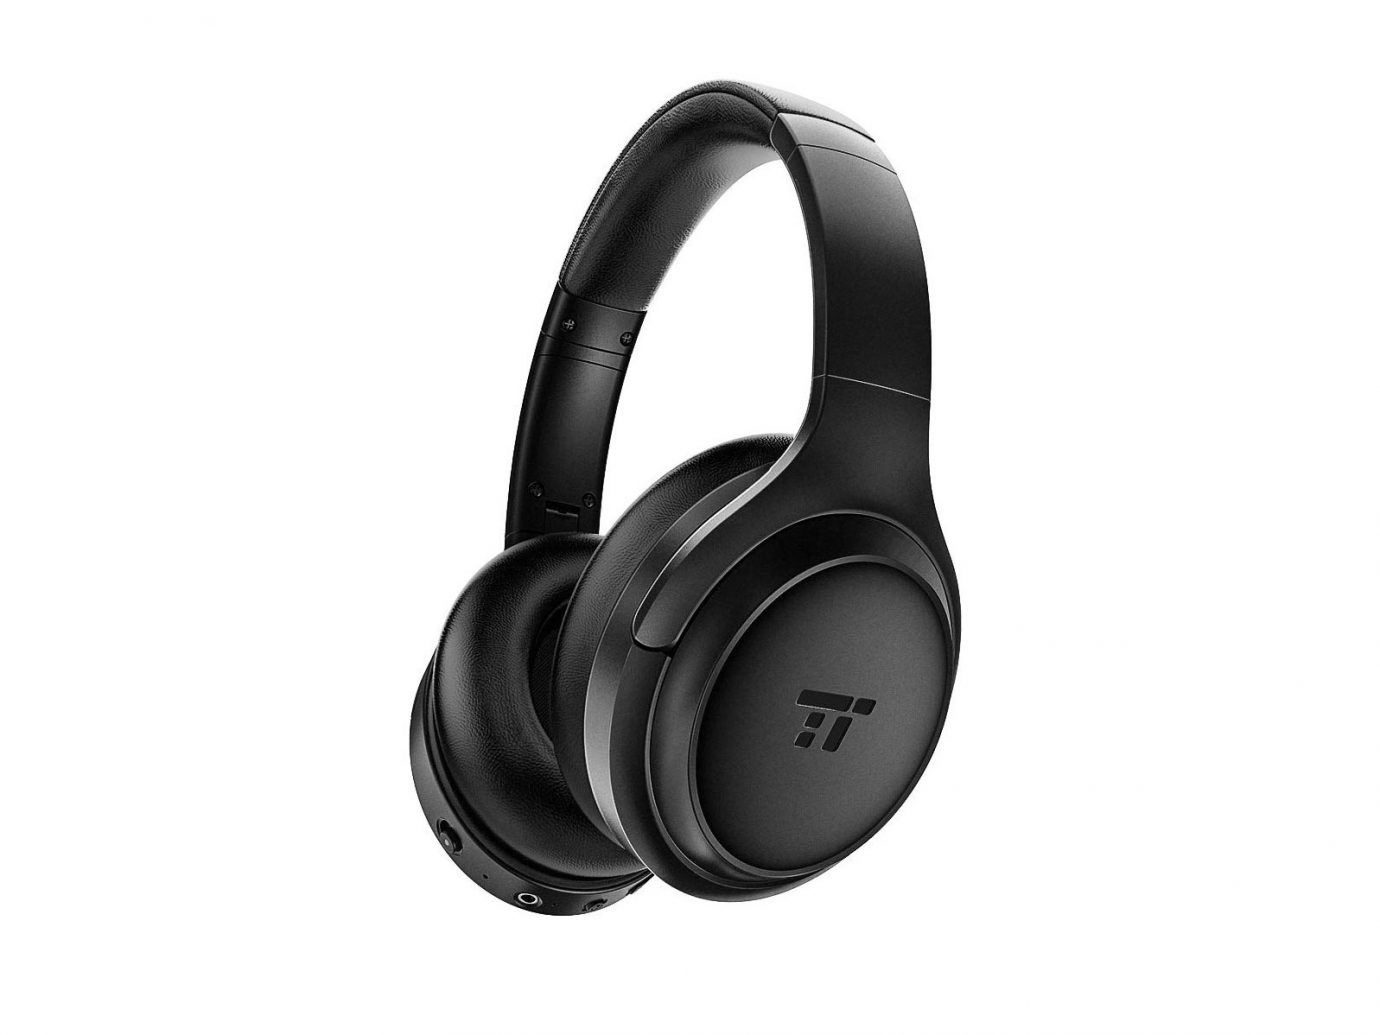 TaoTronics Active Noise Canceling Over-Ear Headphones